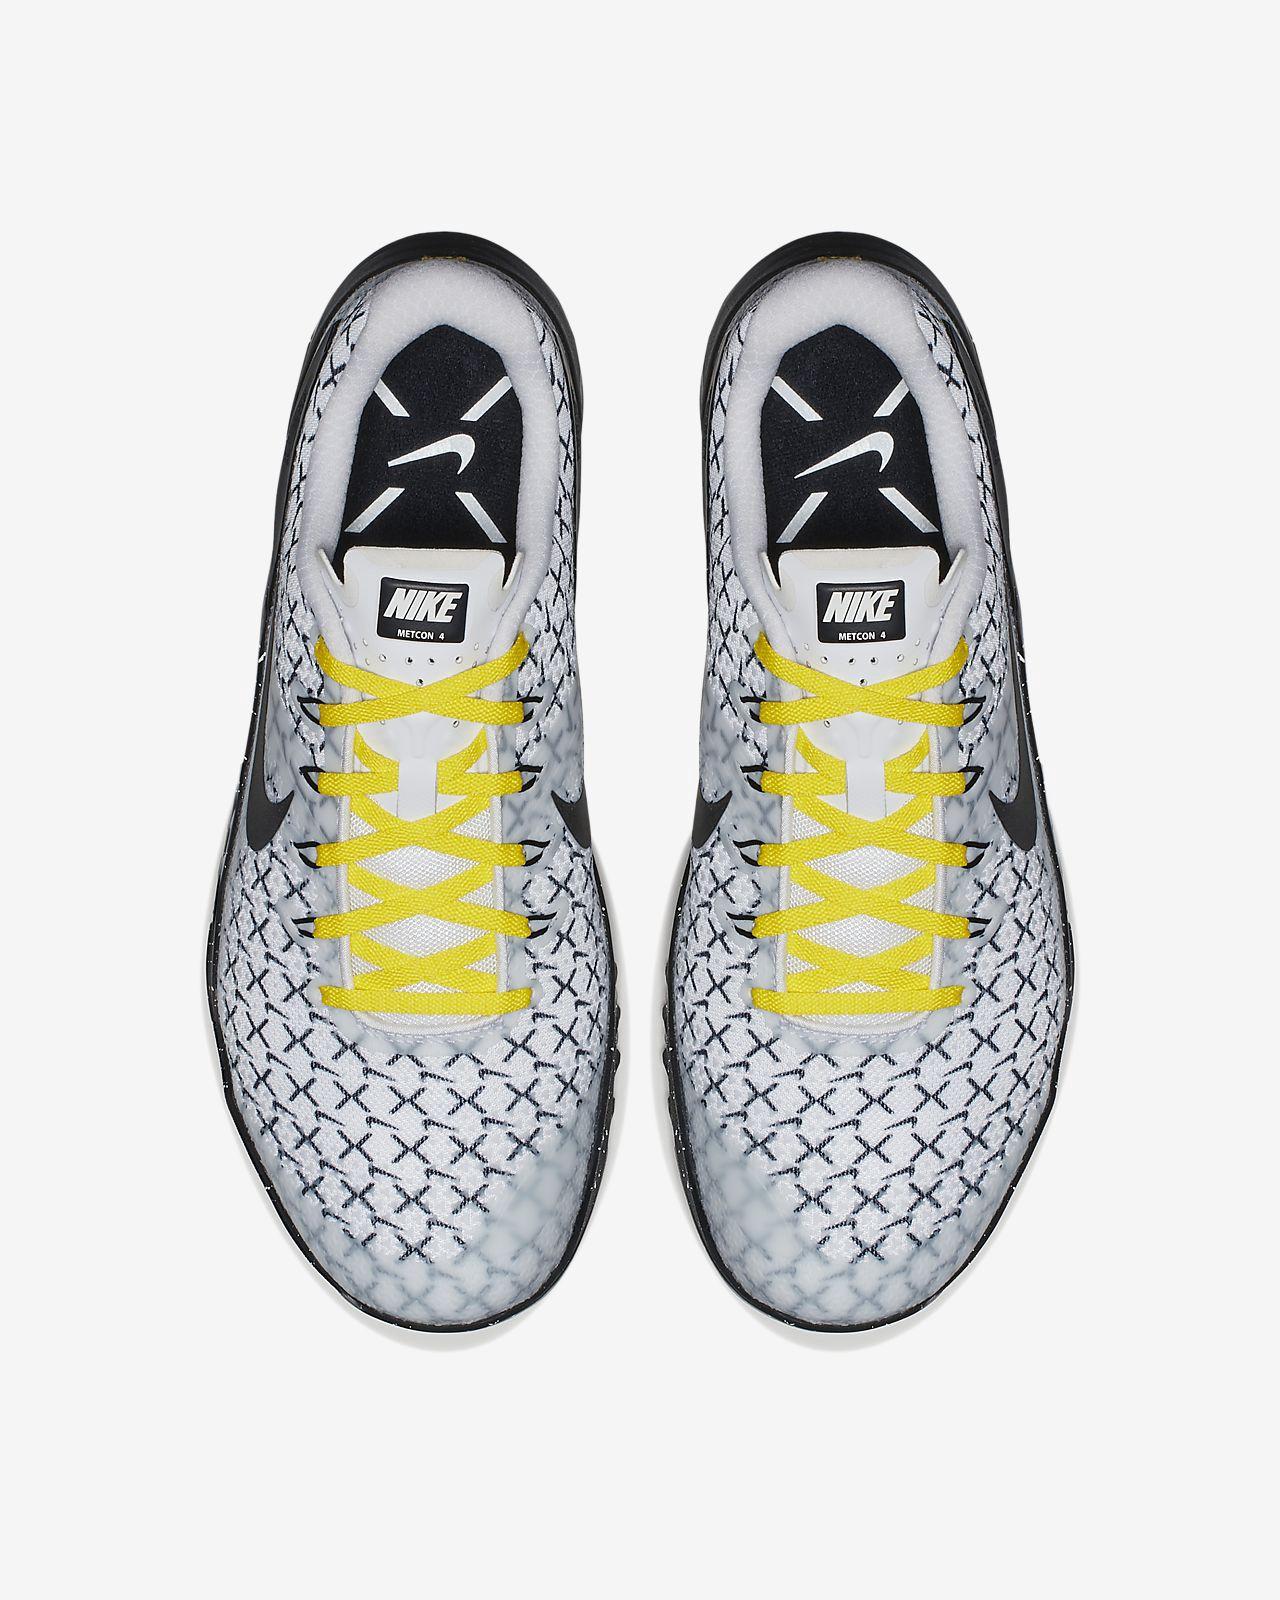 watch f41ad 9faaa Nike Metcon 4 X Men's Cross Training/Weightlifting Shoe - 6 ...